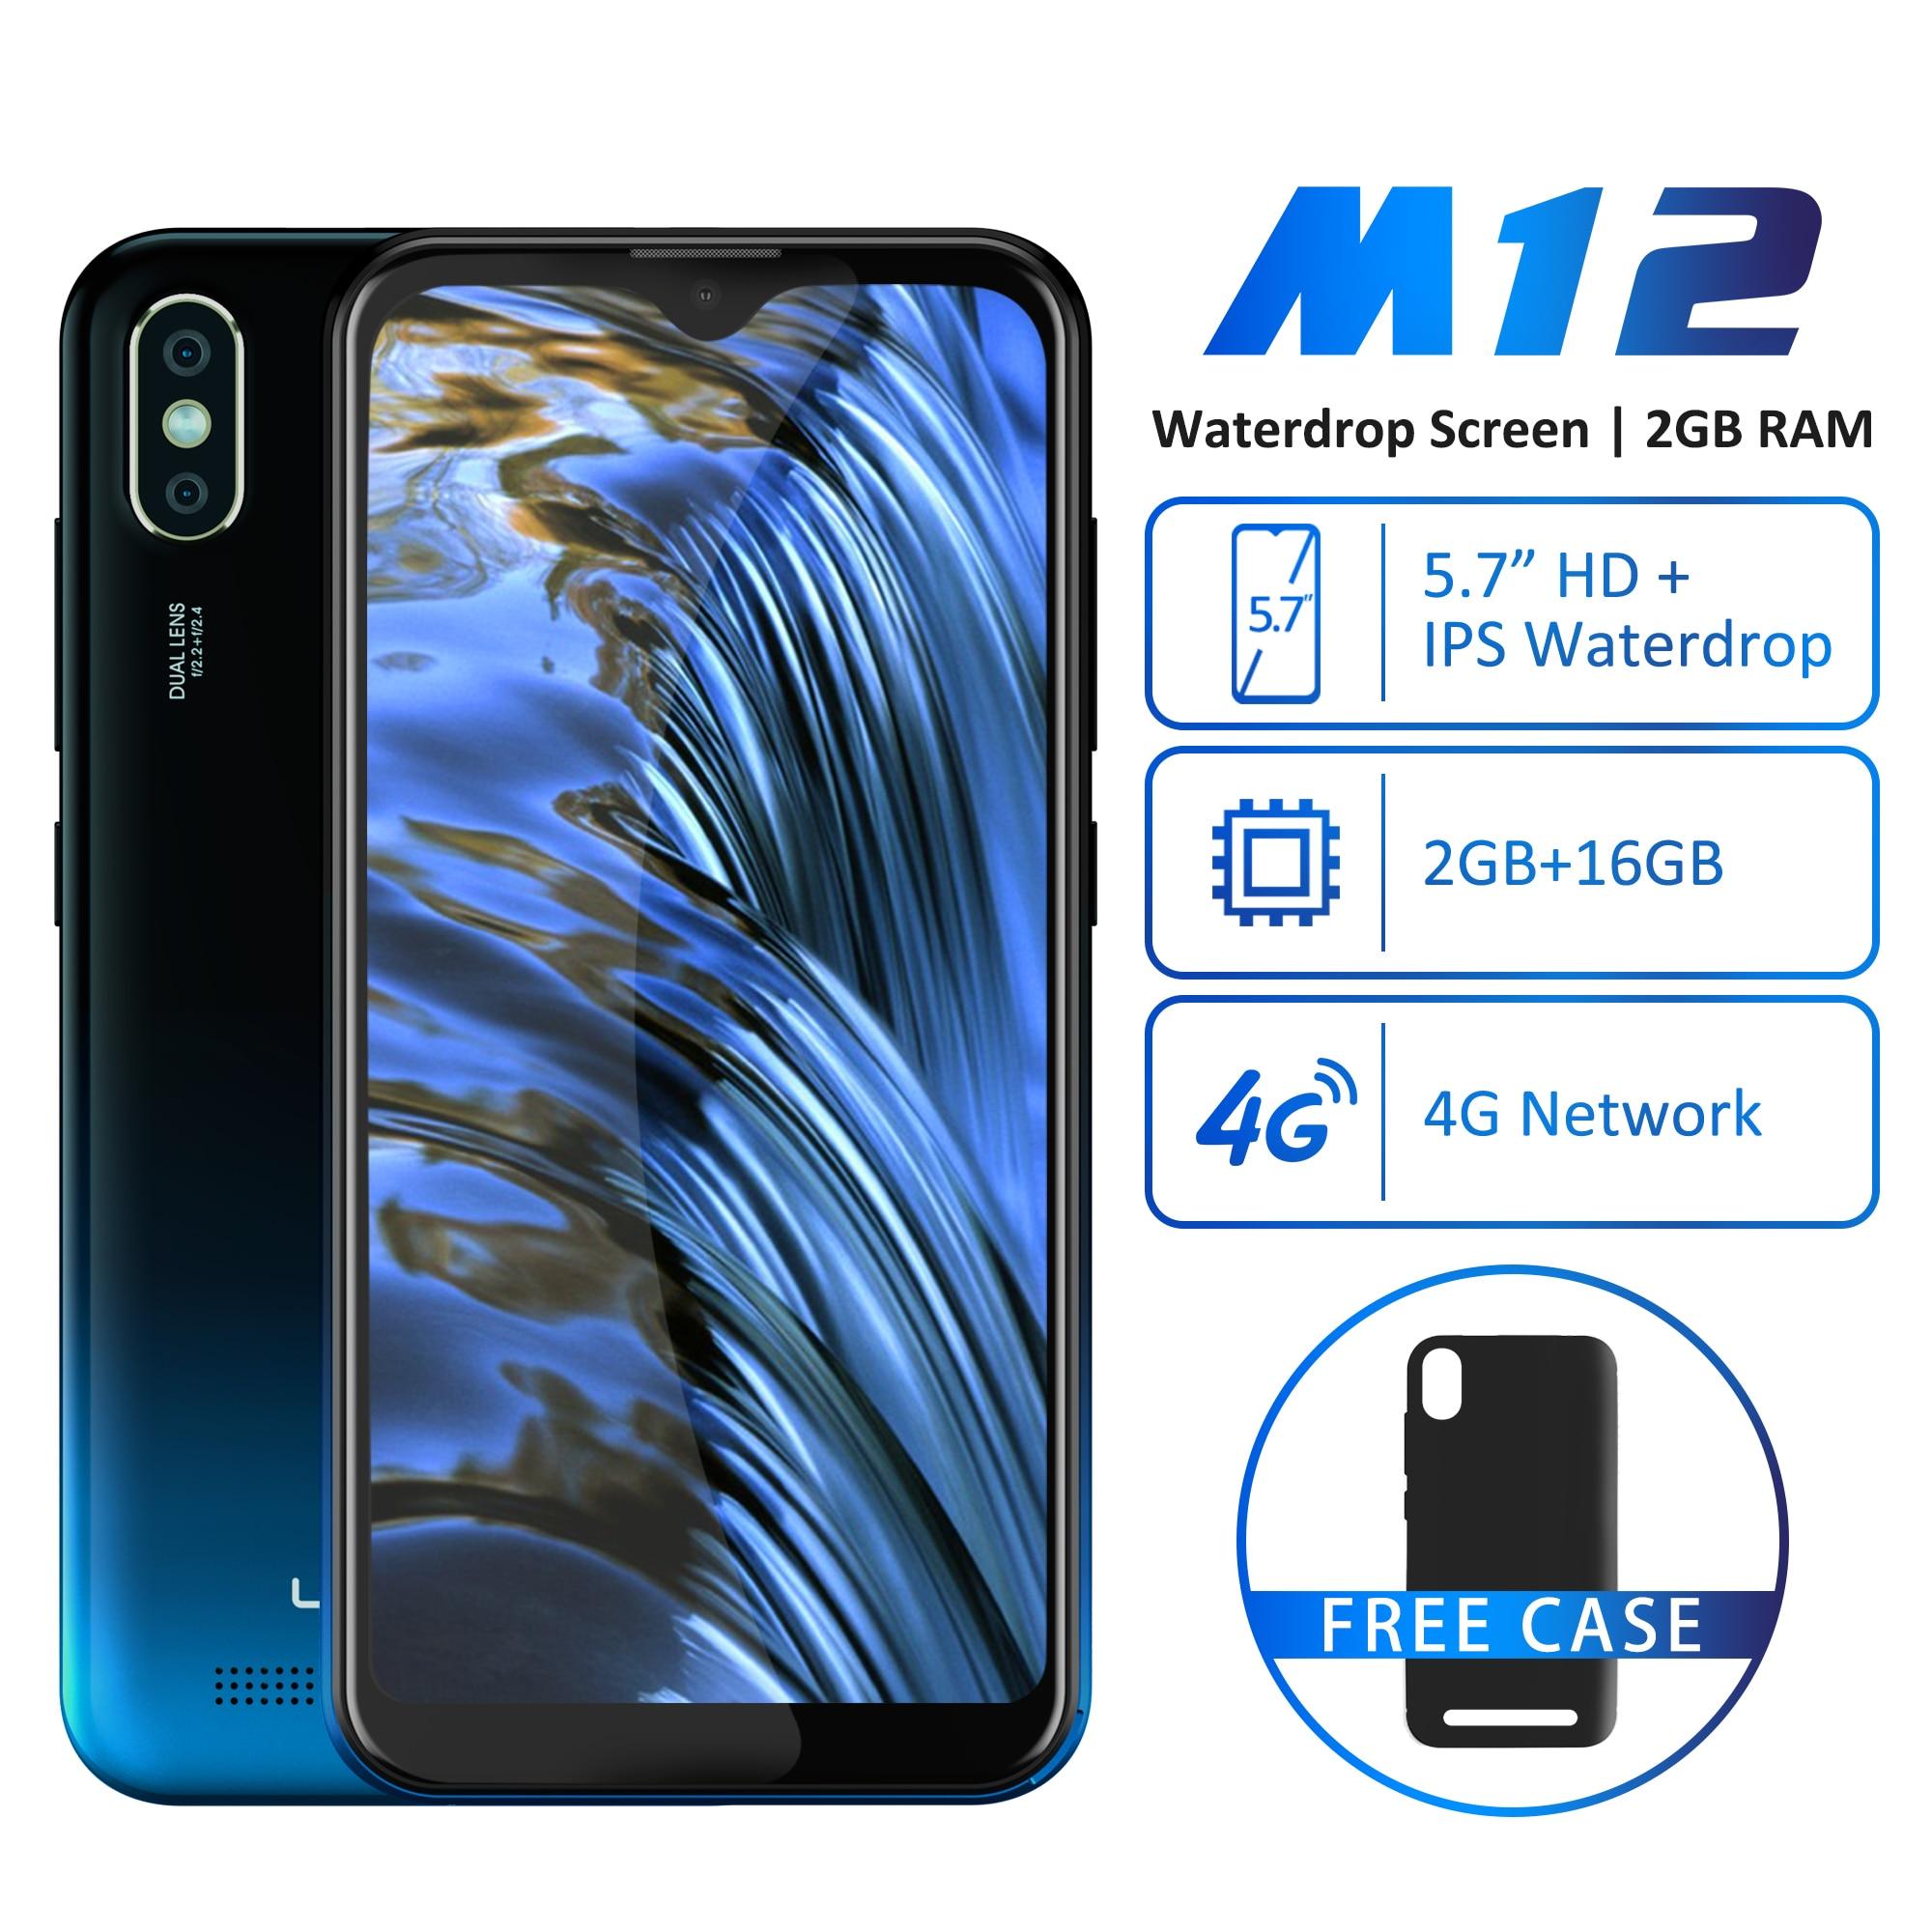 Фото. Мобильный телефон LEAGOO M12 5,7 дюйм HD + экран капли воды 2 Гб ОЗУ 16 Гб ПЗУ MT6739V 3000 мАч